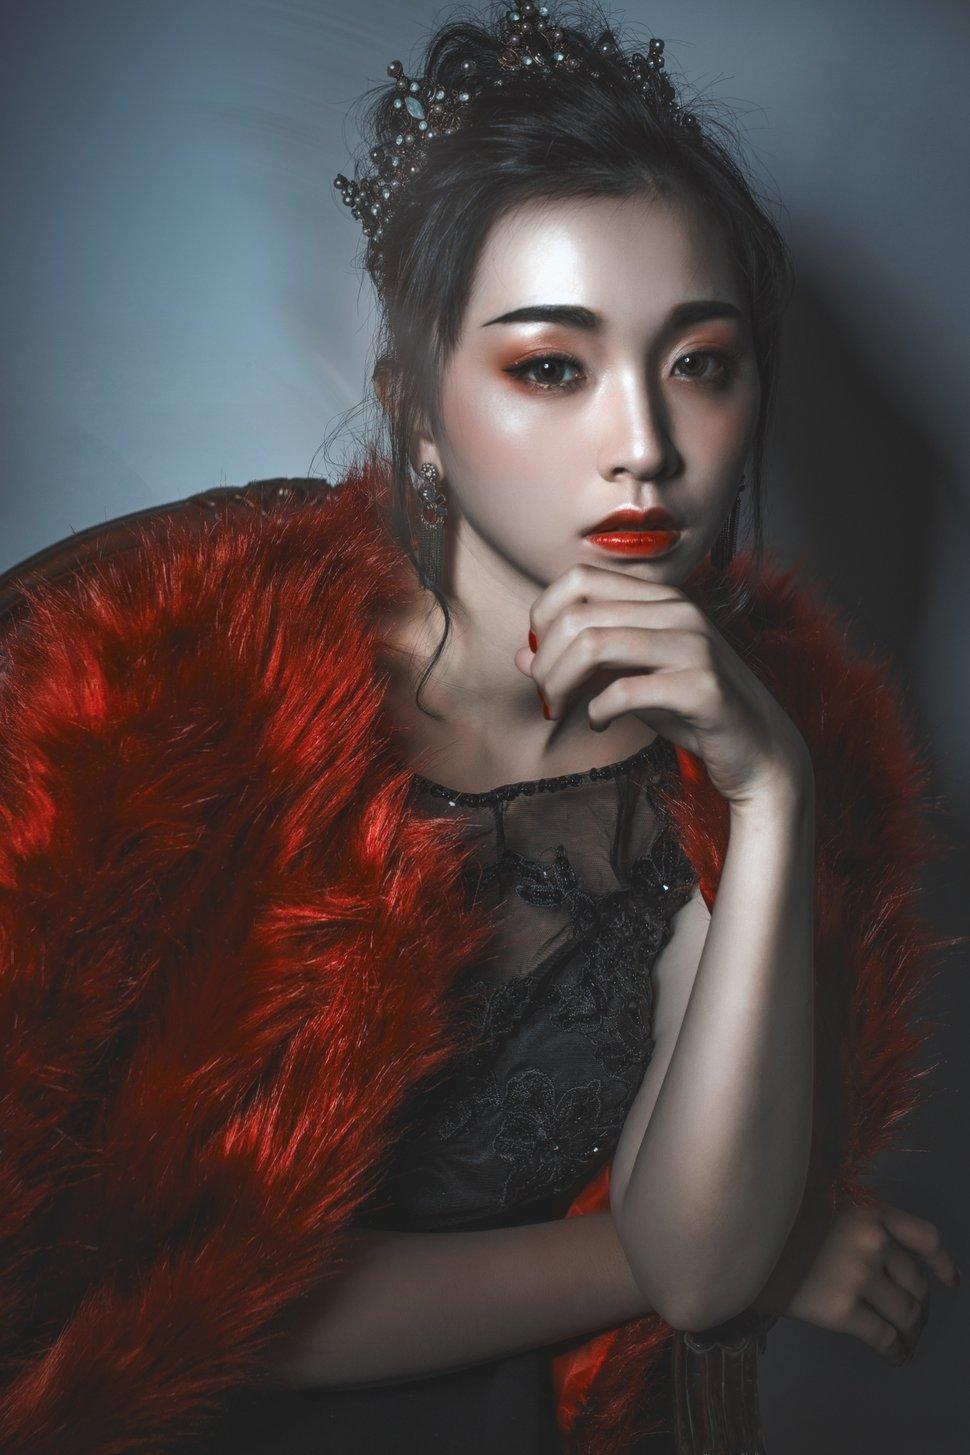 20180807 #2_181121_0011 - Zona時尚美甲x新娘秘書整體造型工作室《結婚吧》